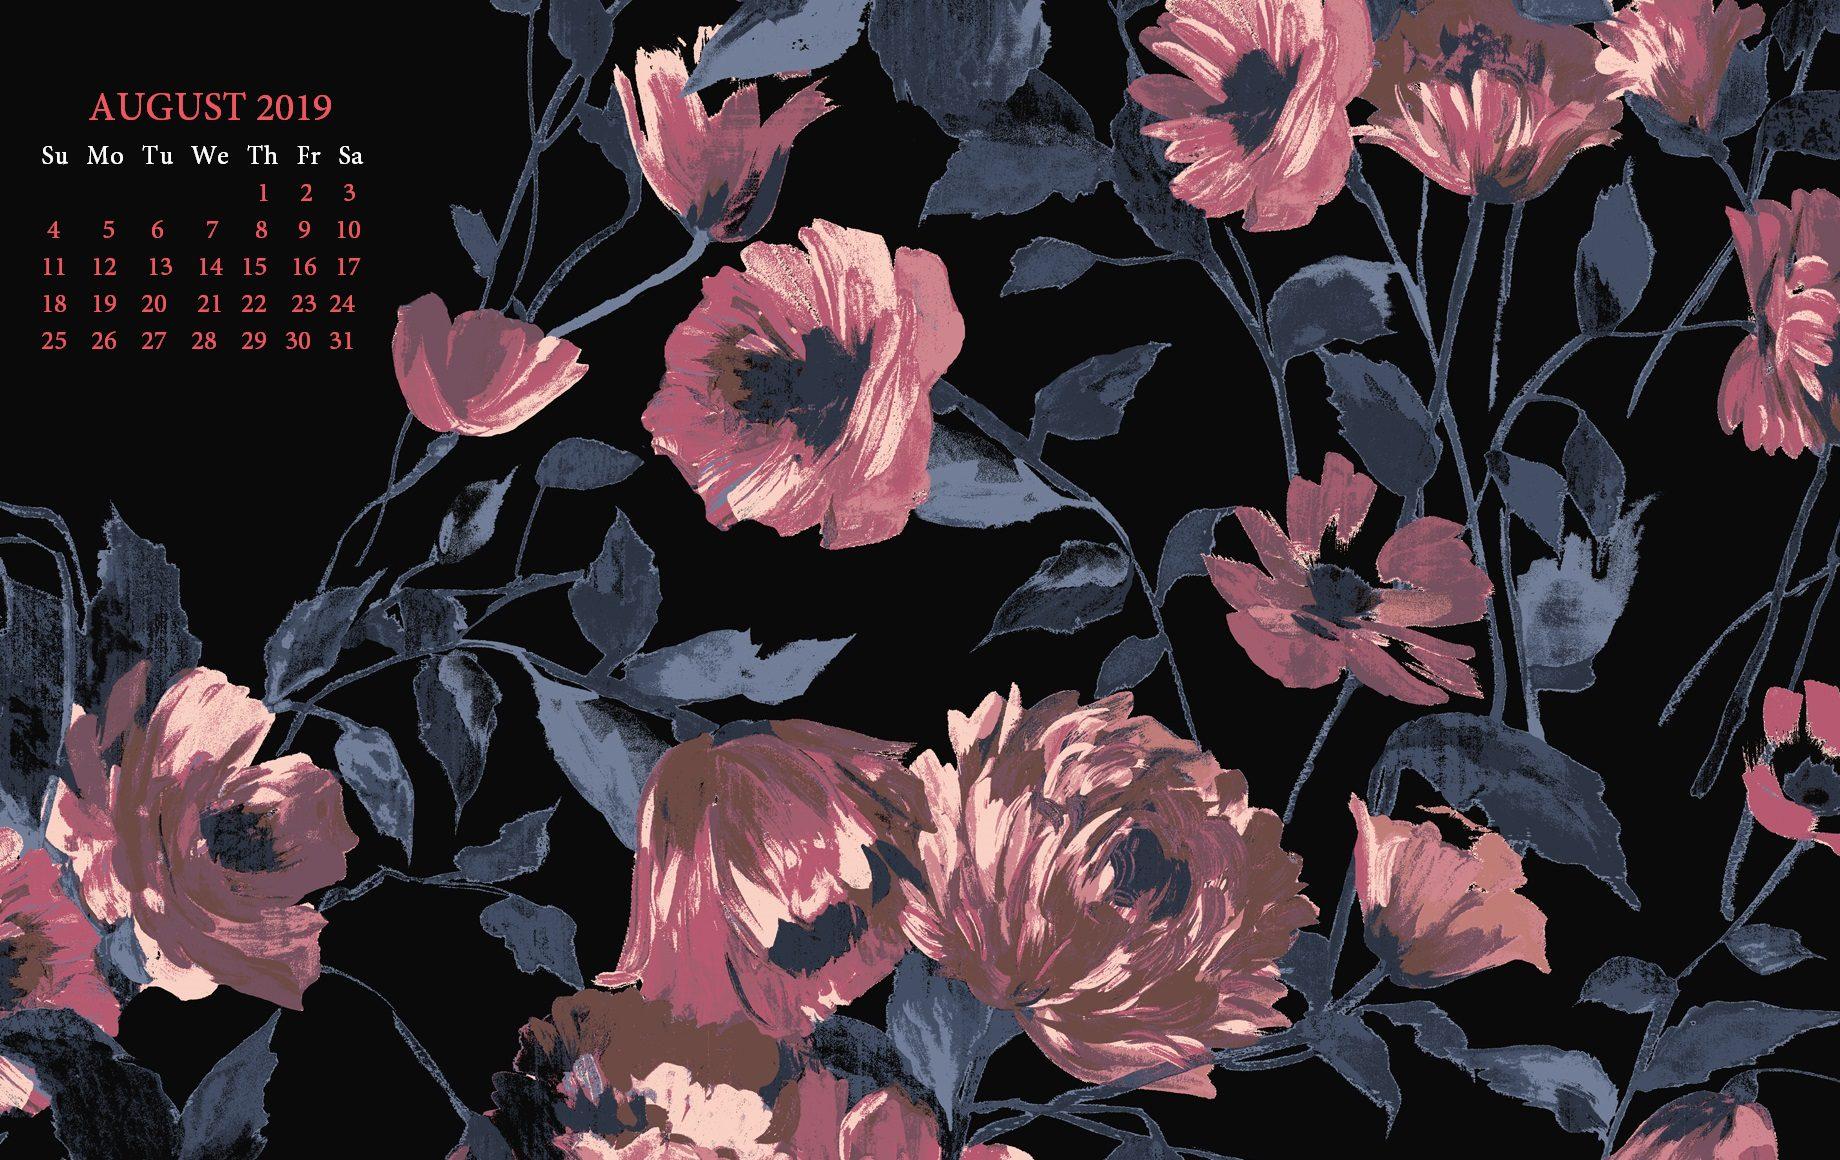 Beautiful August 2019 Desktop Wallpaper